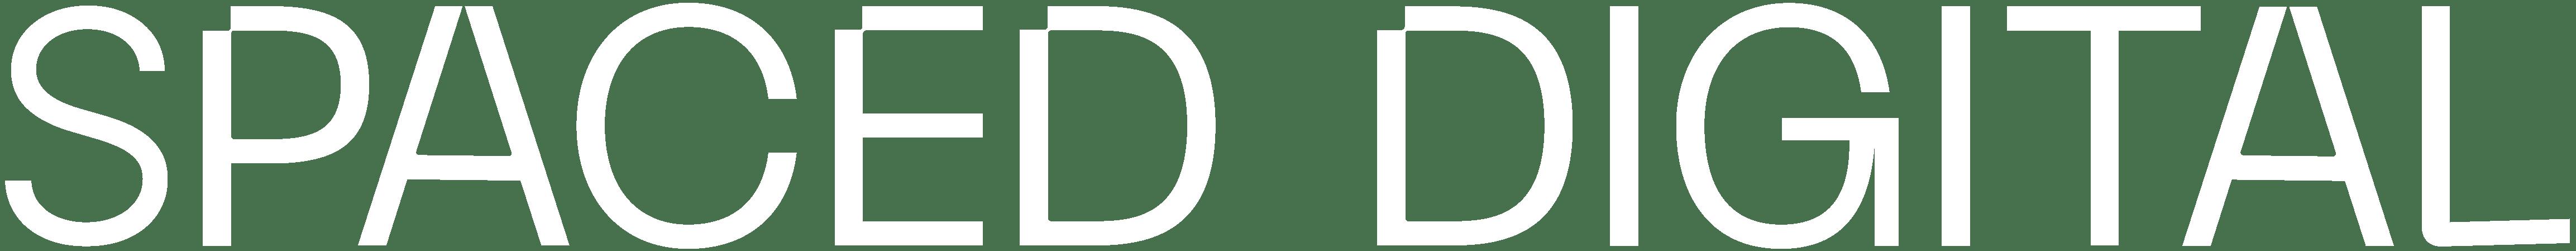 Spaced Digital logo